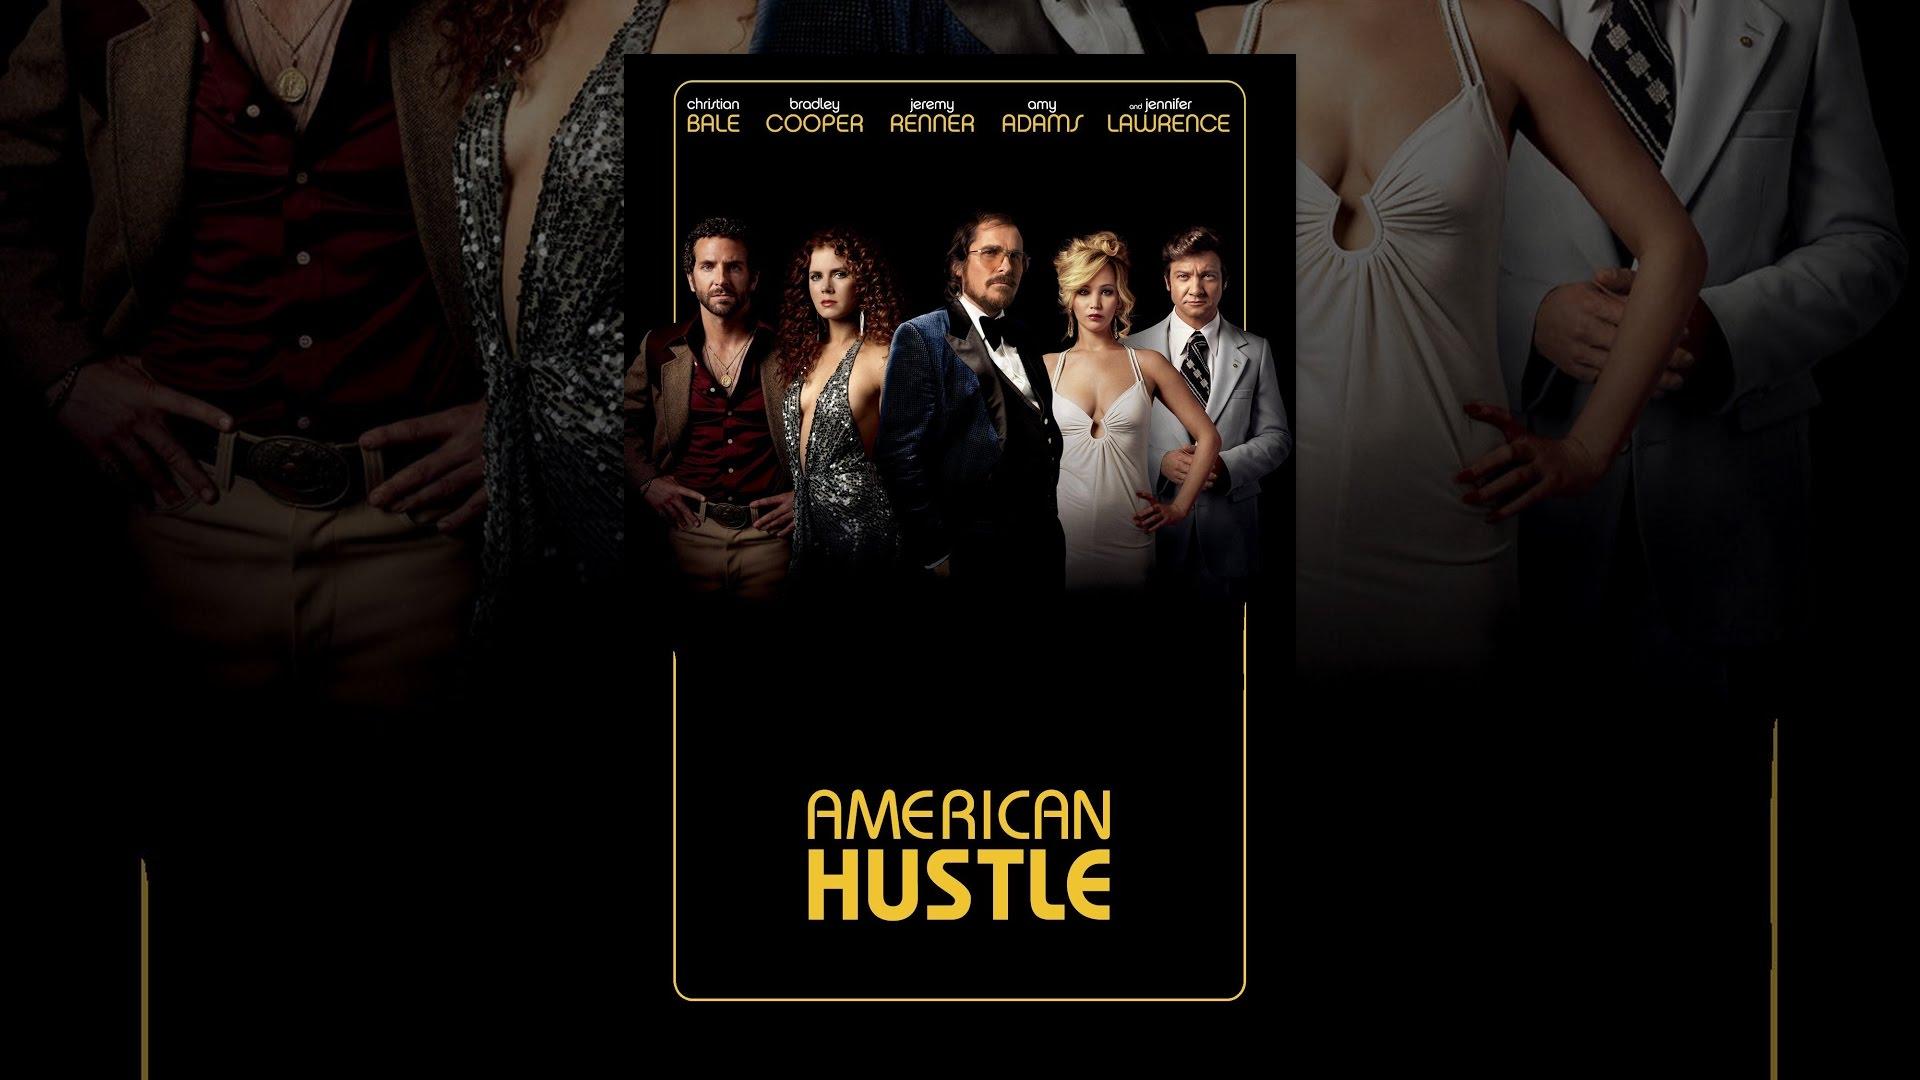 American Hustle - Original Motion Picture Soundtrack Out